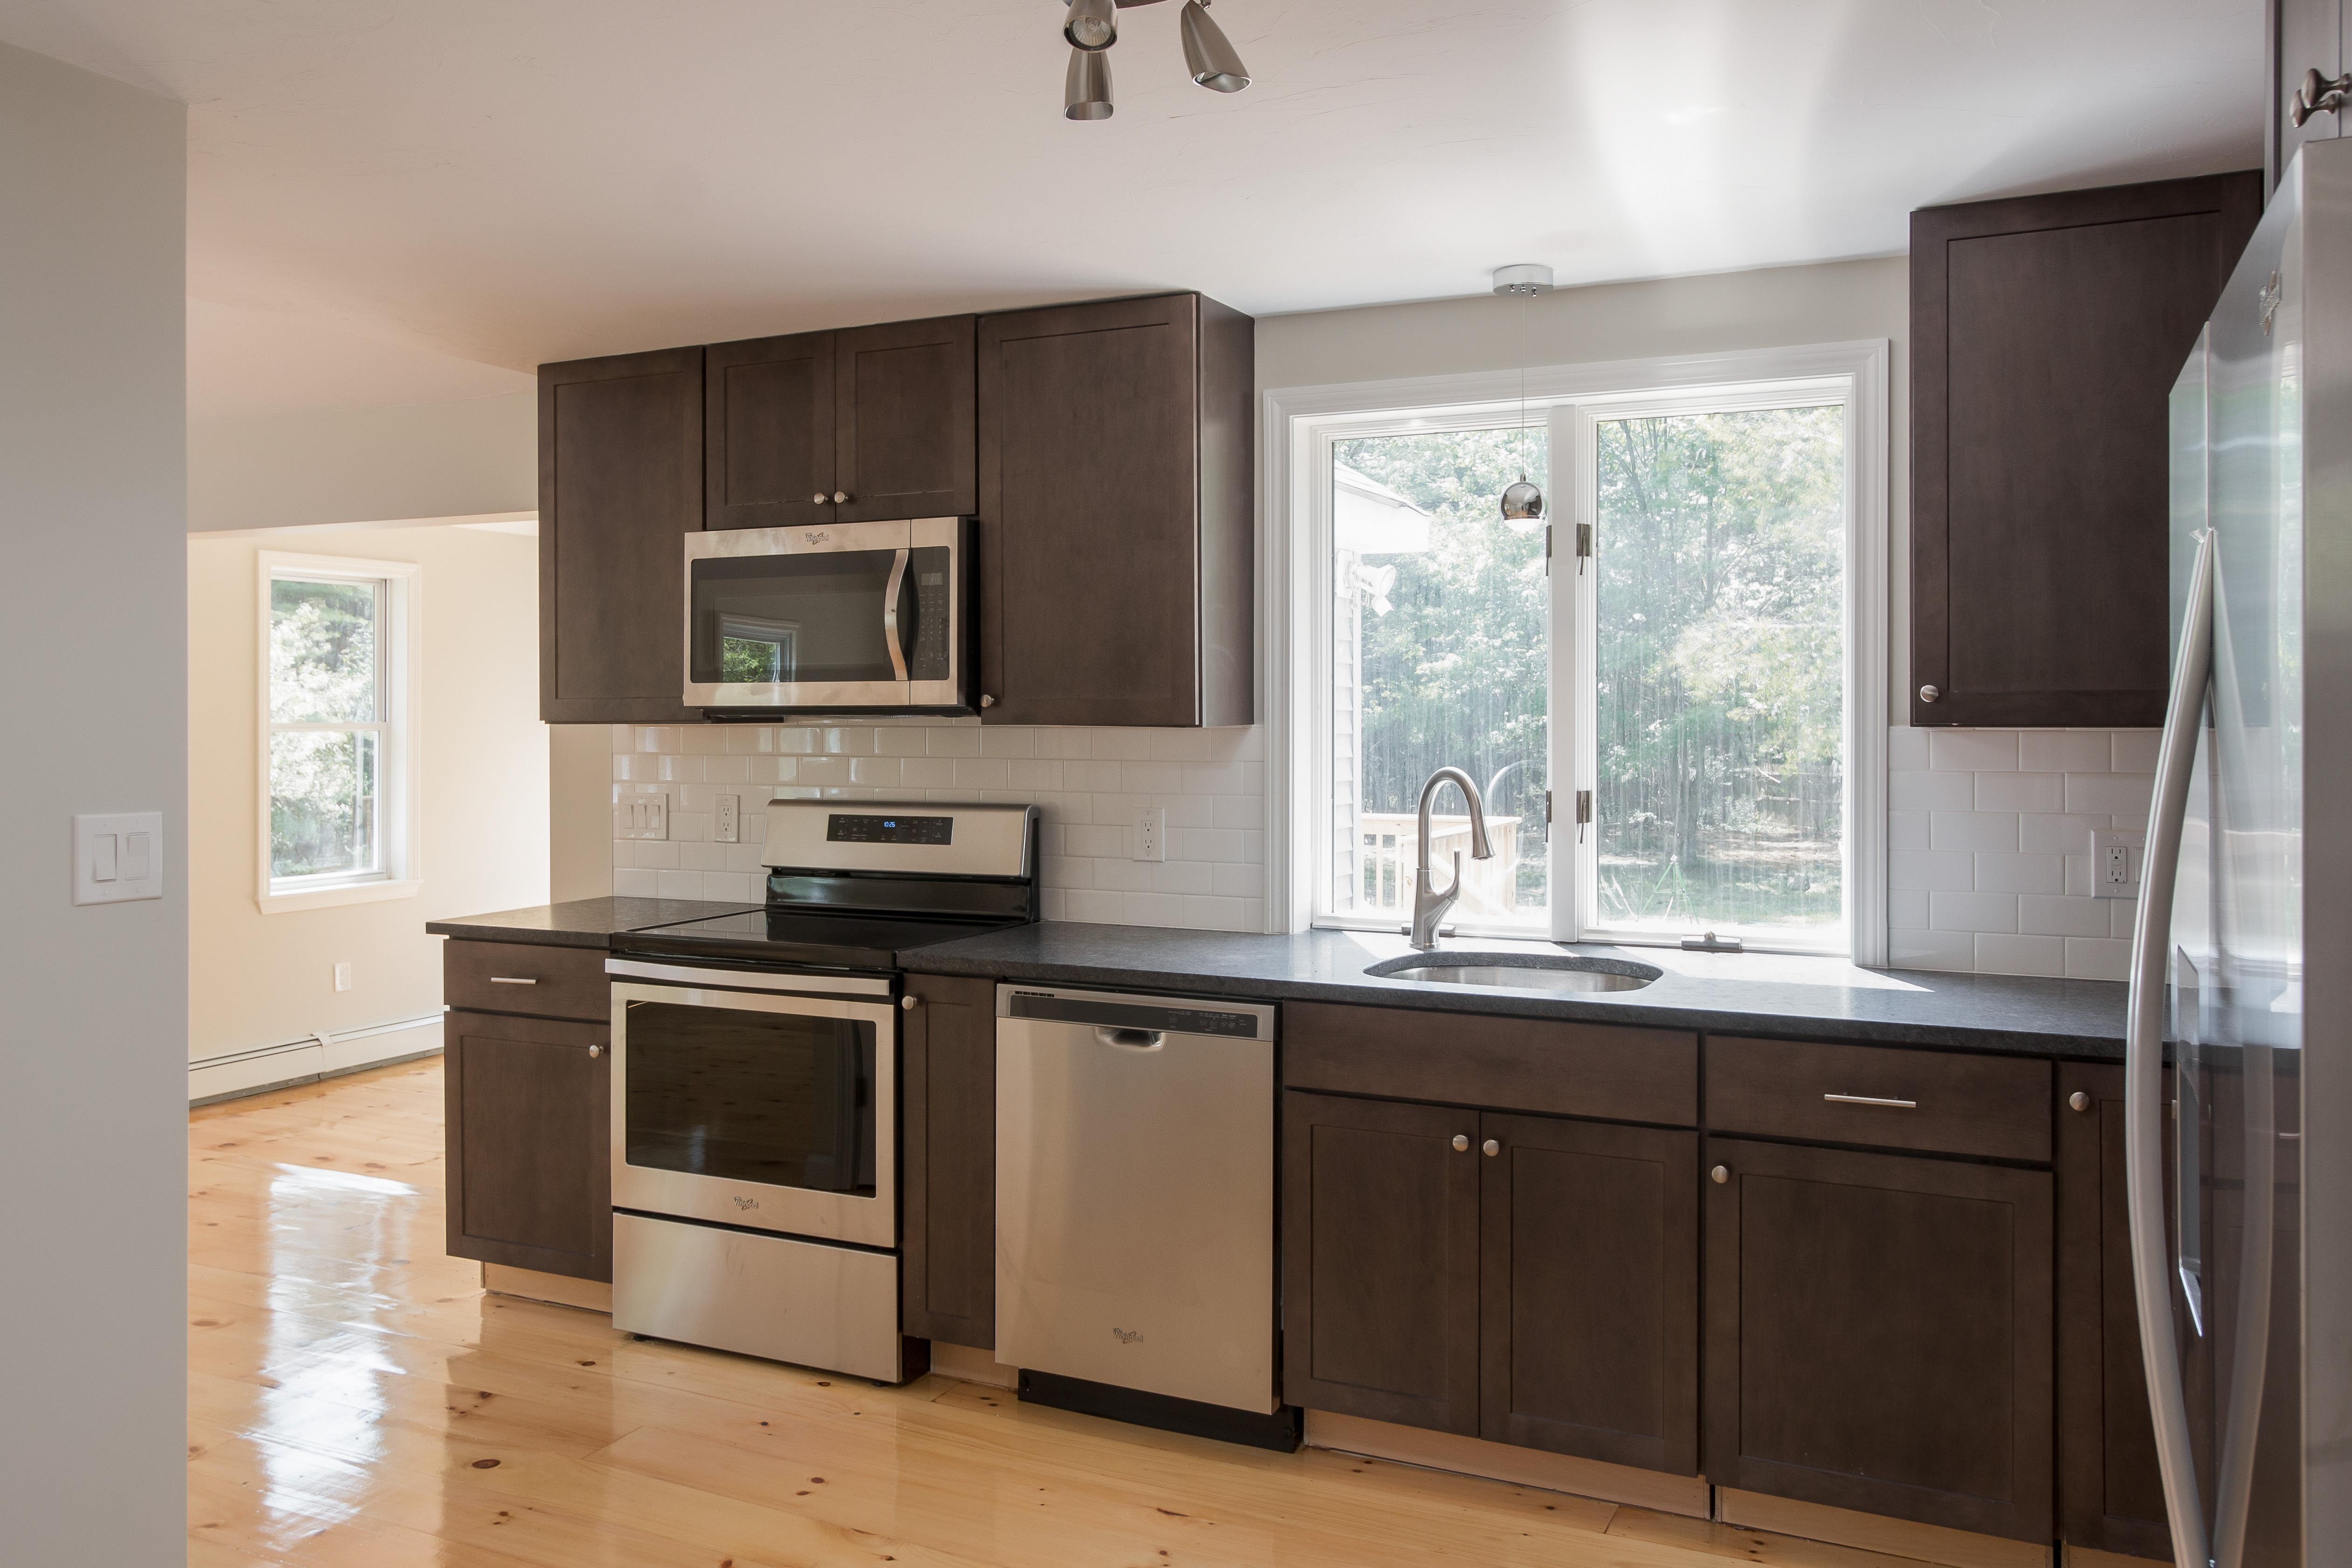 Kitchen Remodel in Douglas MA